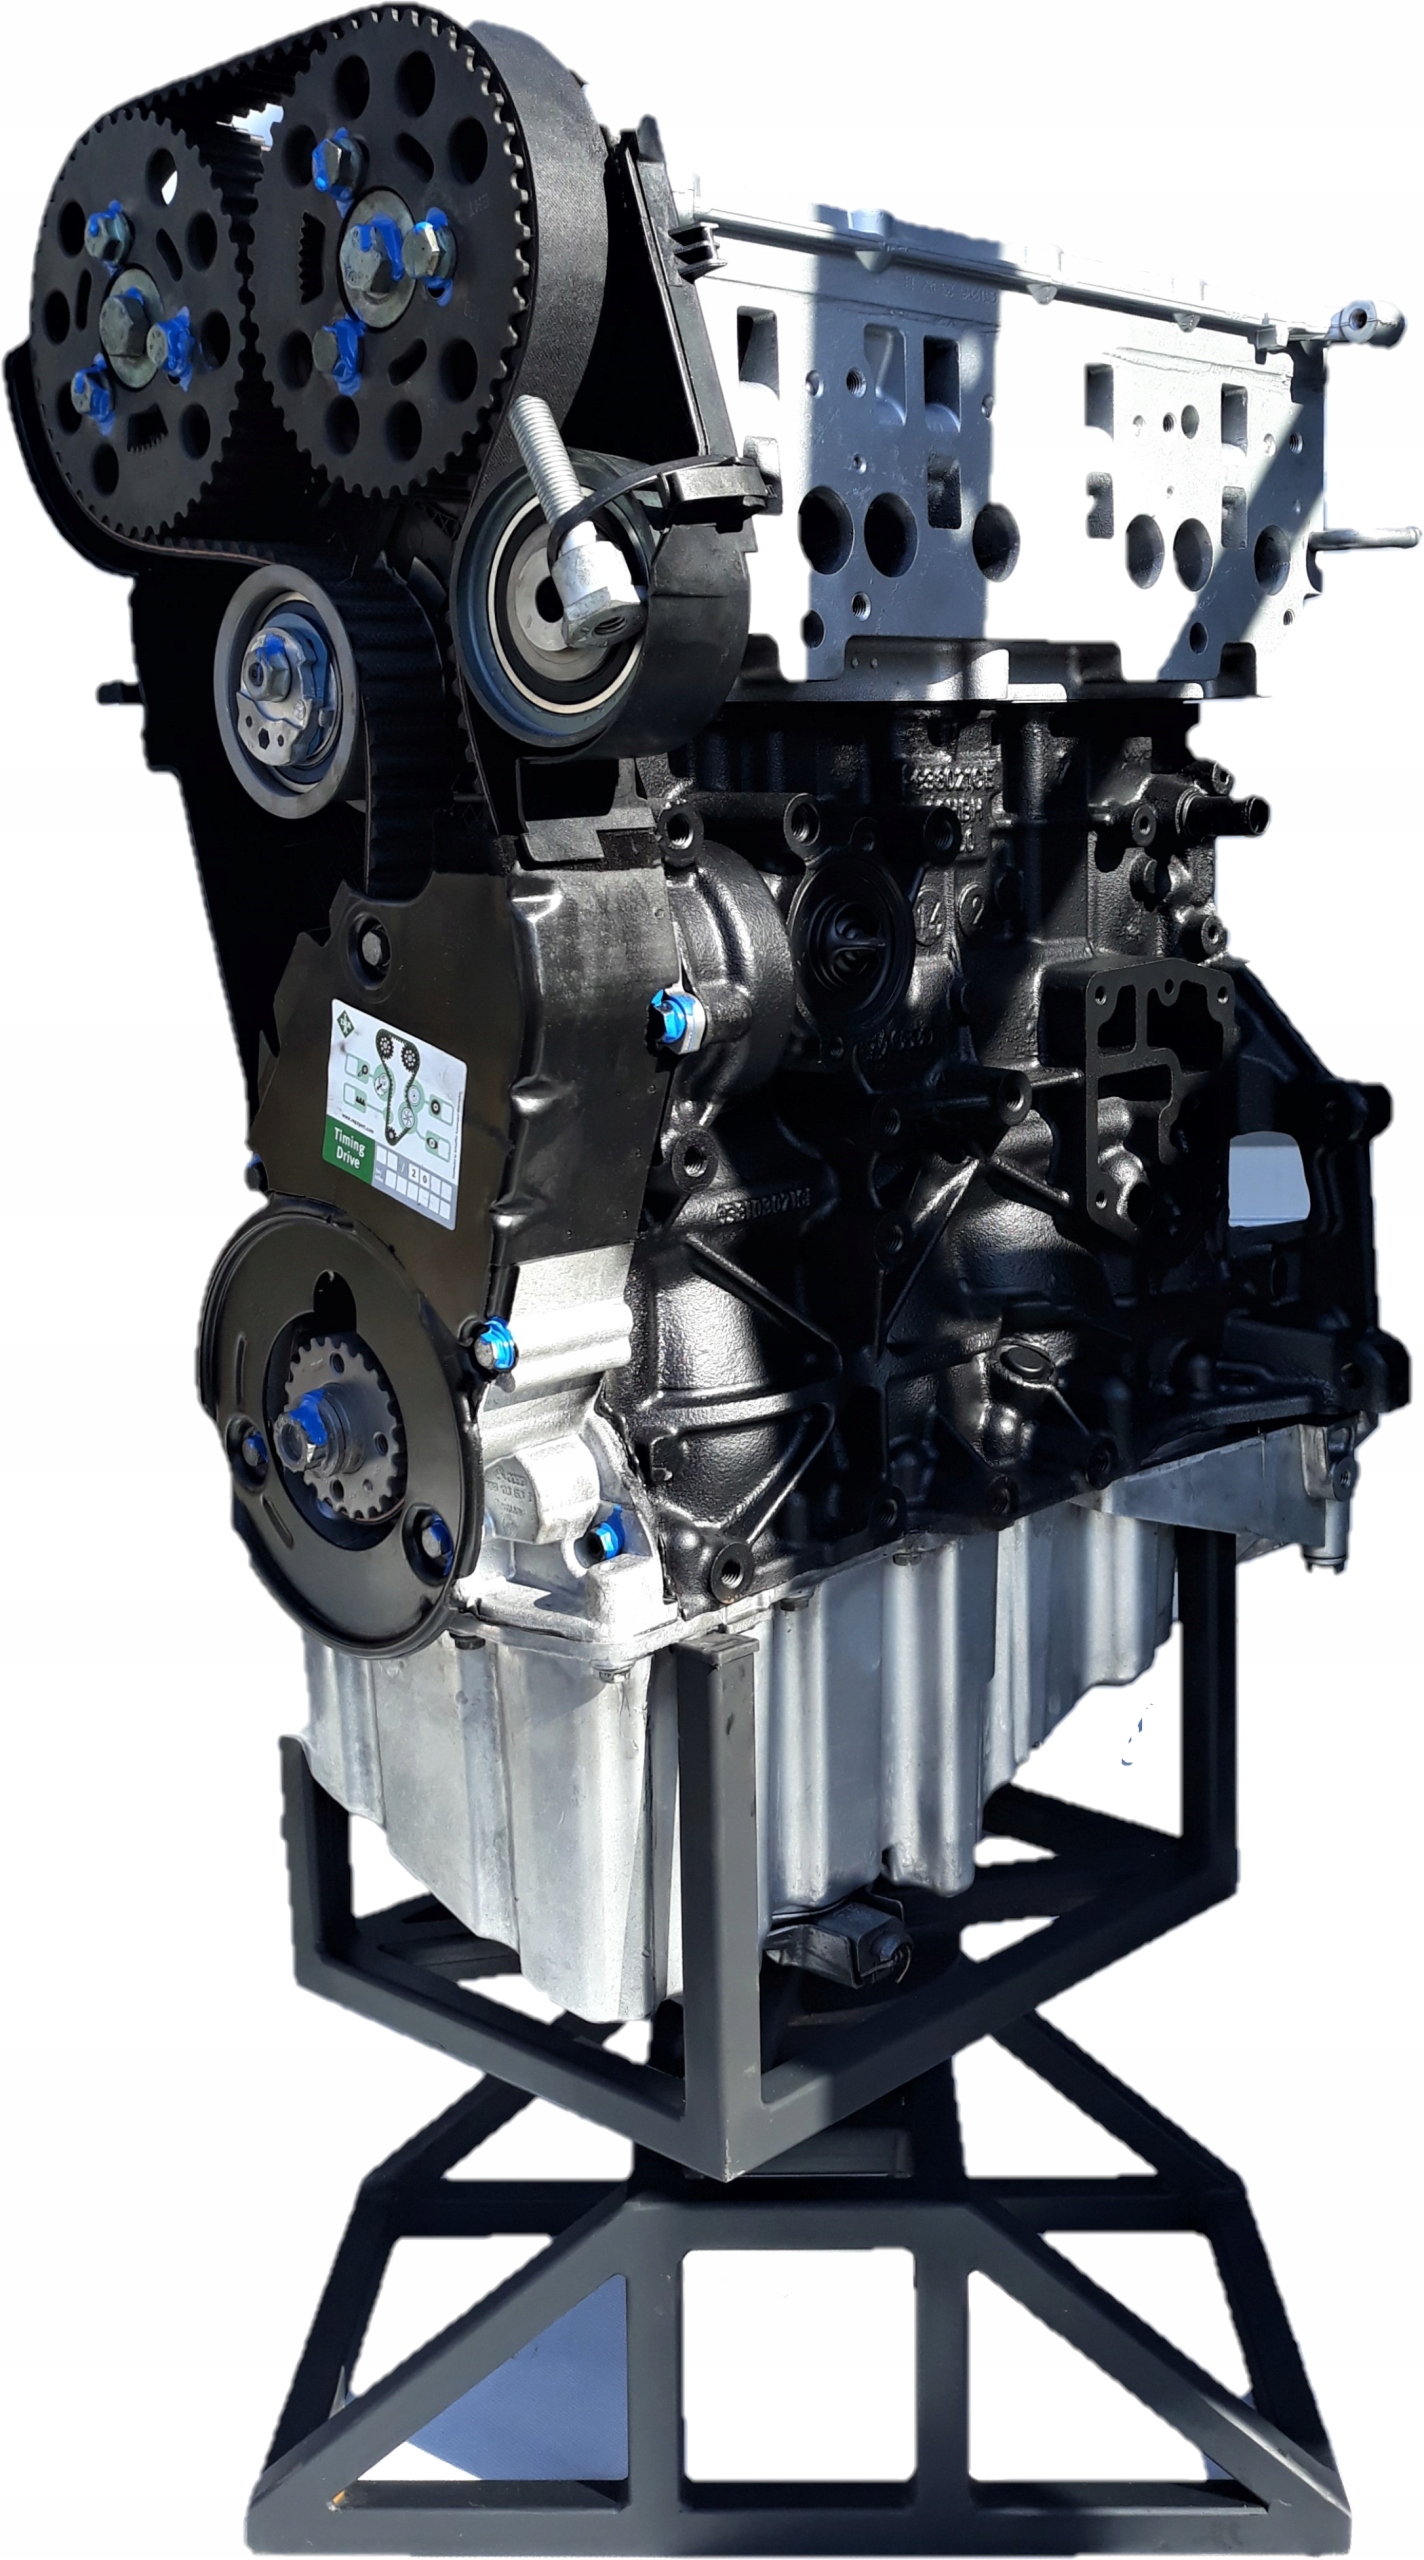 гарантия двигатель blb bre brd bna 20 16v 170km